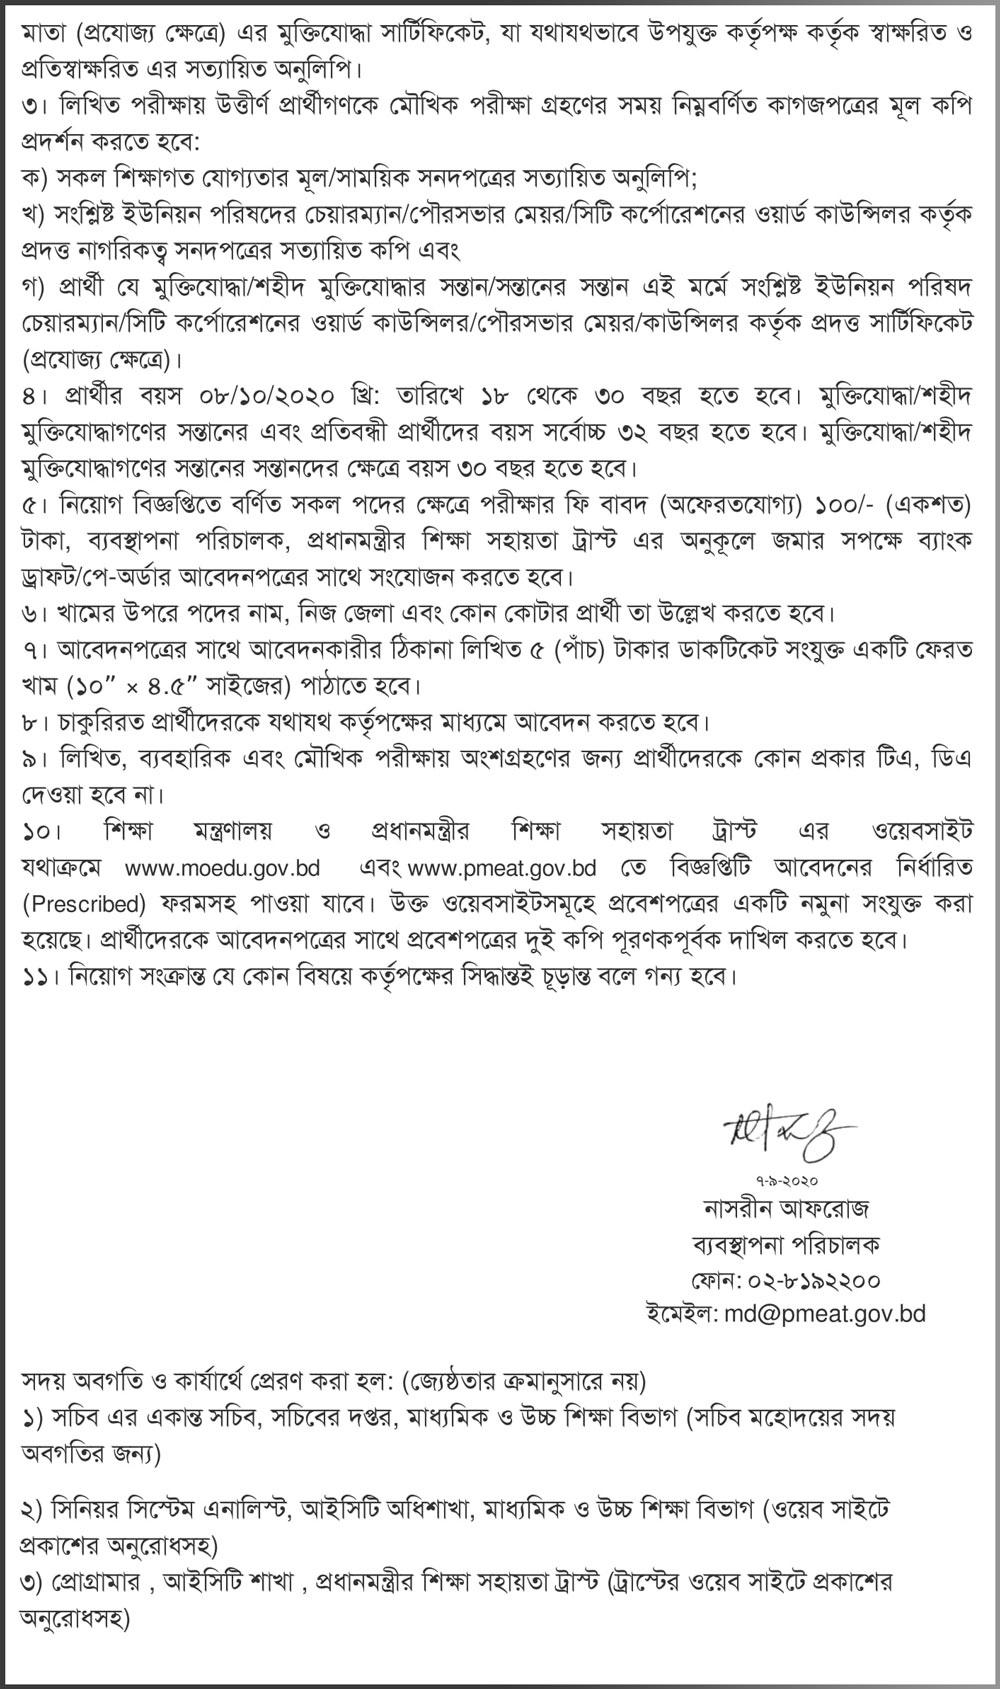 PMEAT Job Circular Apply 2020 - pmeat gov bd